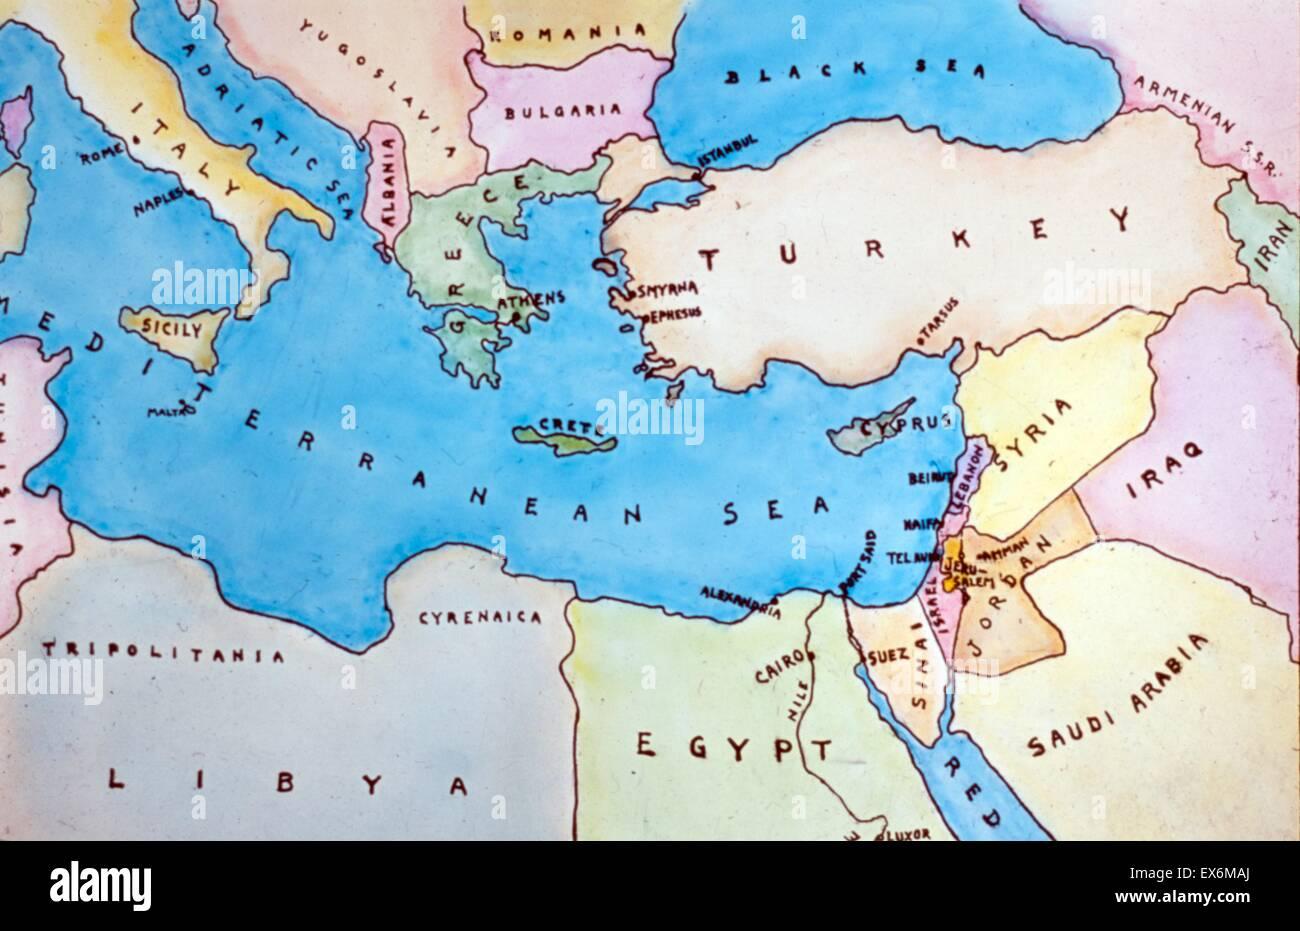 Cartina Geografica Mediterraneo Orientale.Mappa Del Mediterraneo Orientale E Nei Paesi Circostanti Datata 1977 Foto Stock Alamy